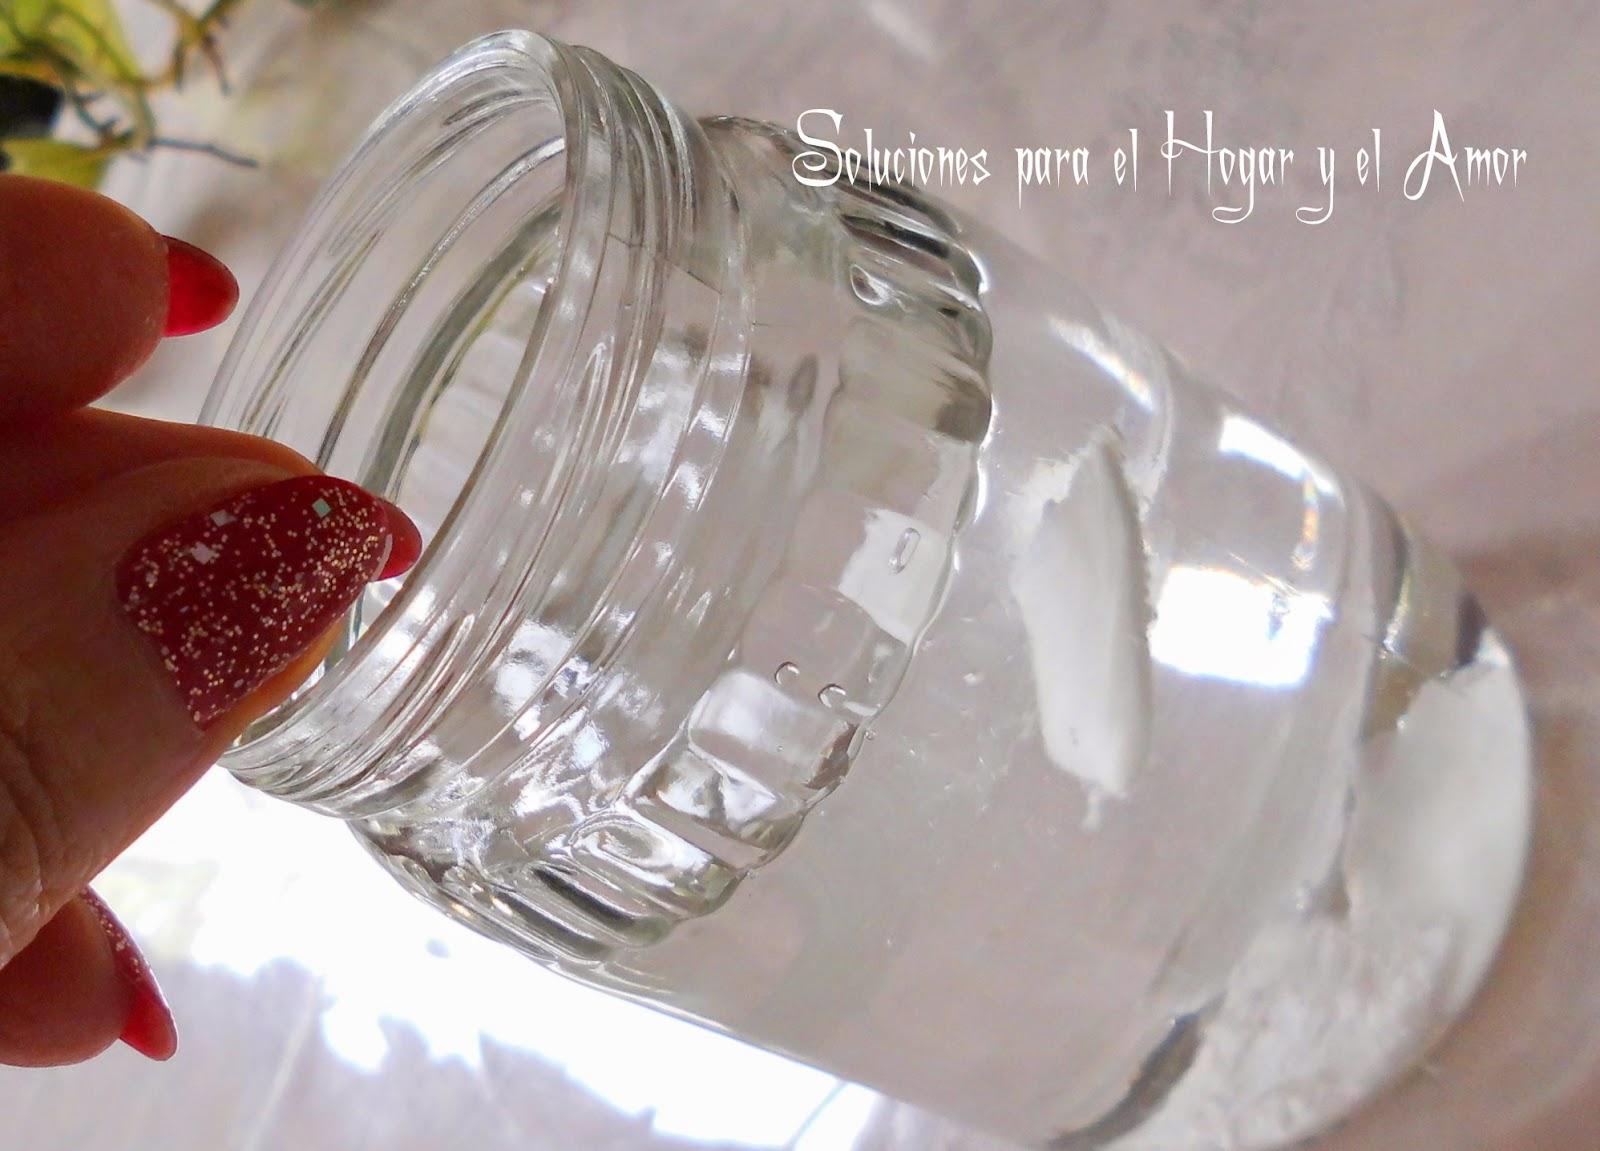 colocar restos de jabón en un frasco con agua para reciclar